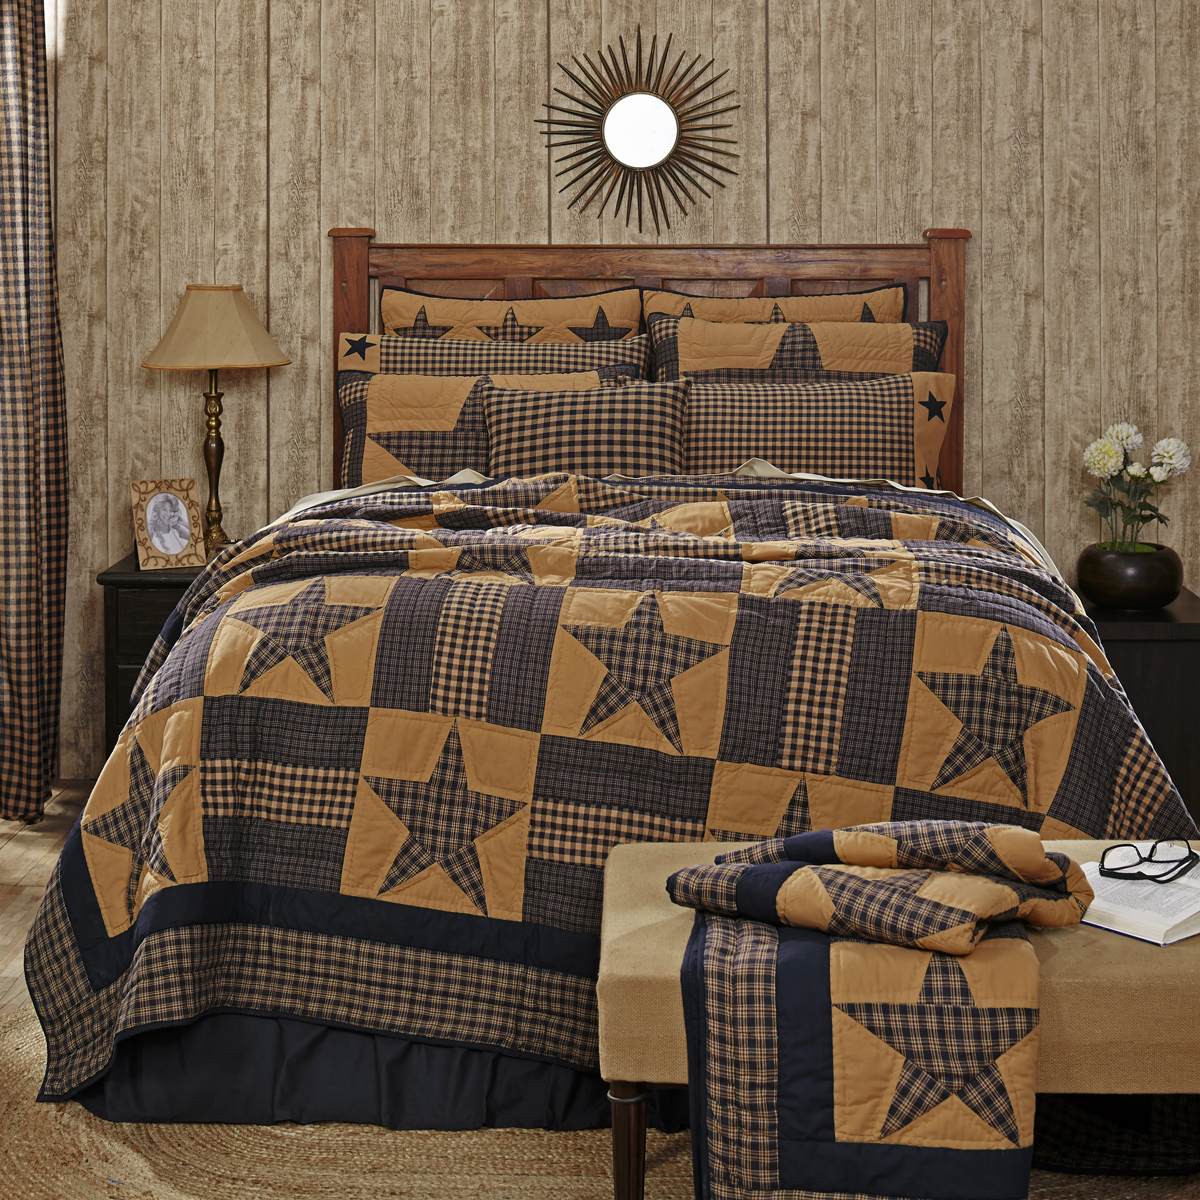 Teton Star Luxury King Quilt 105x120